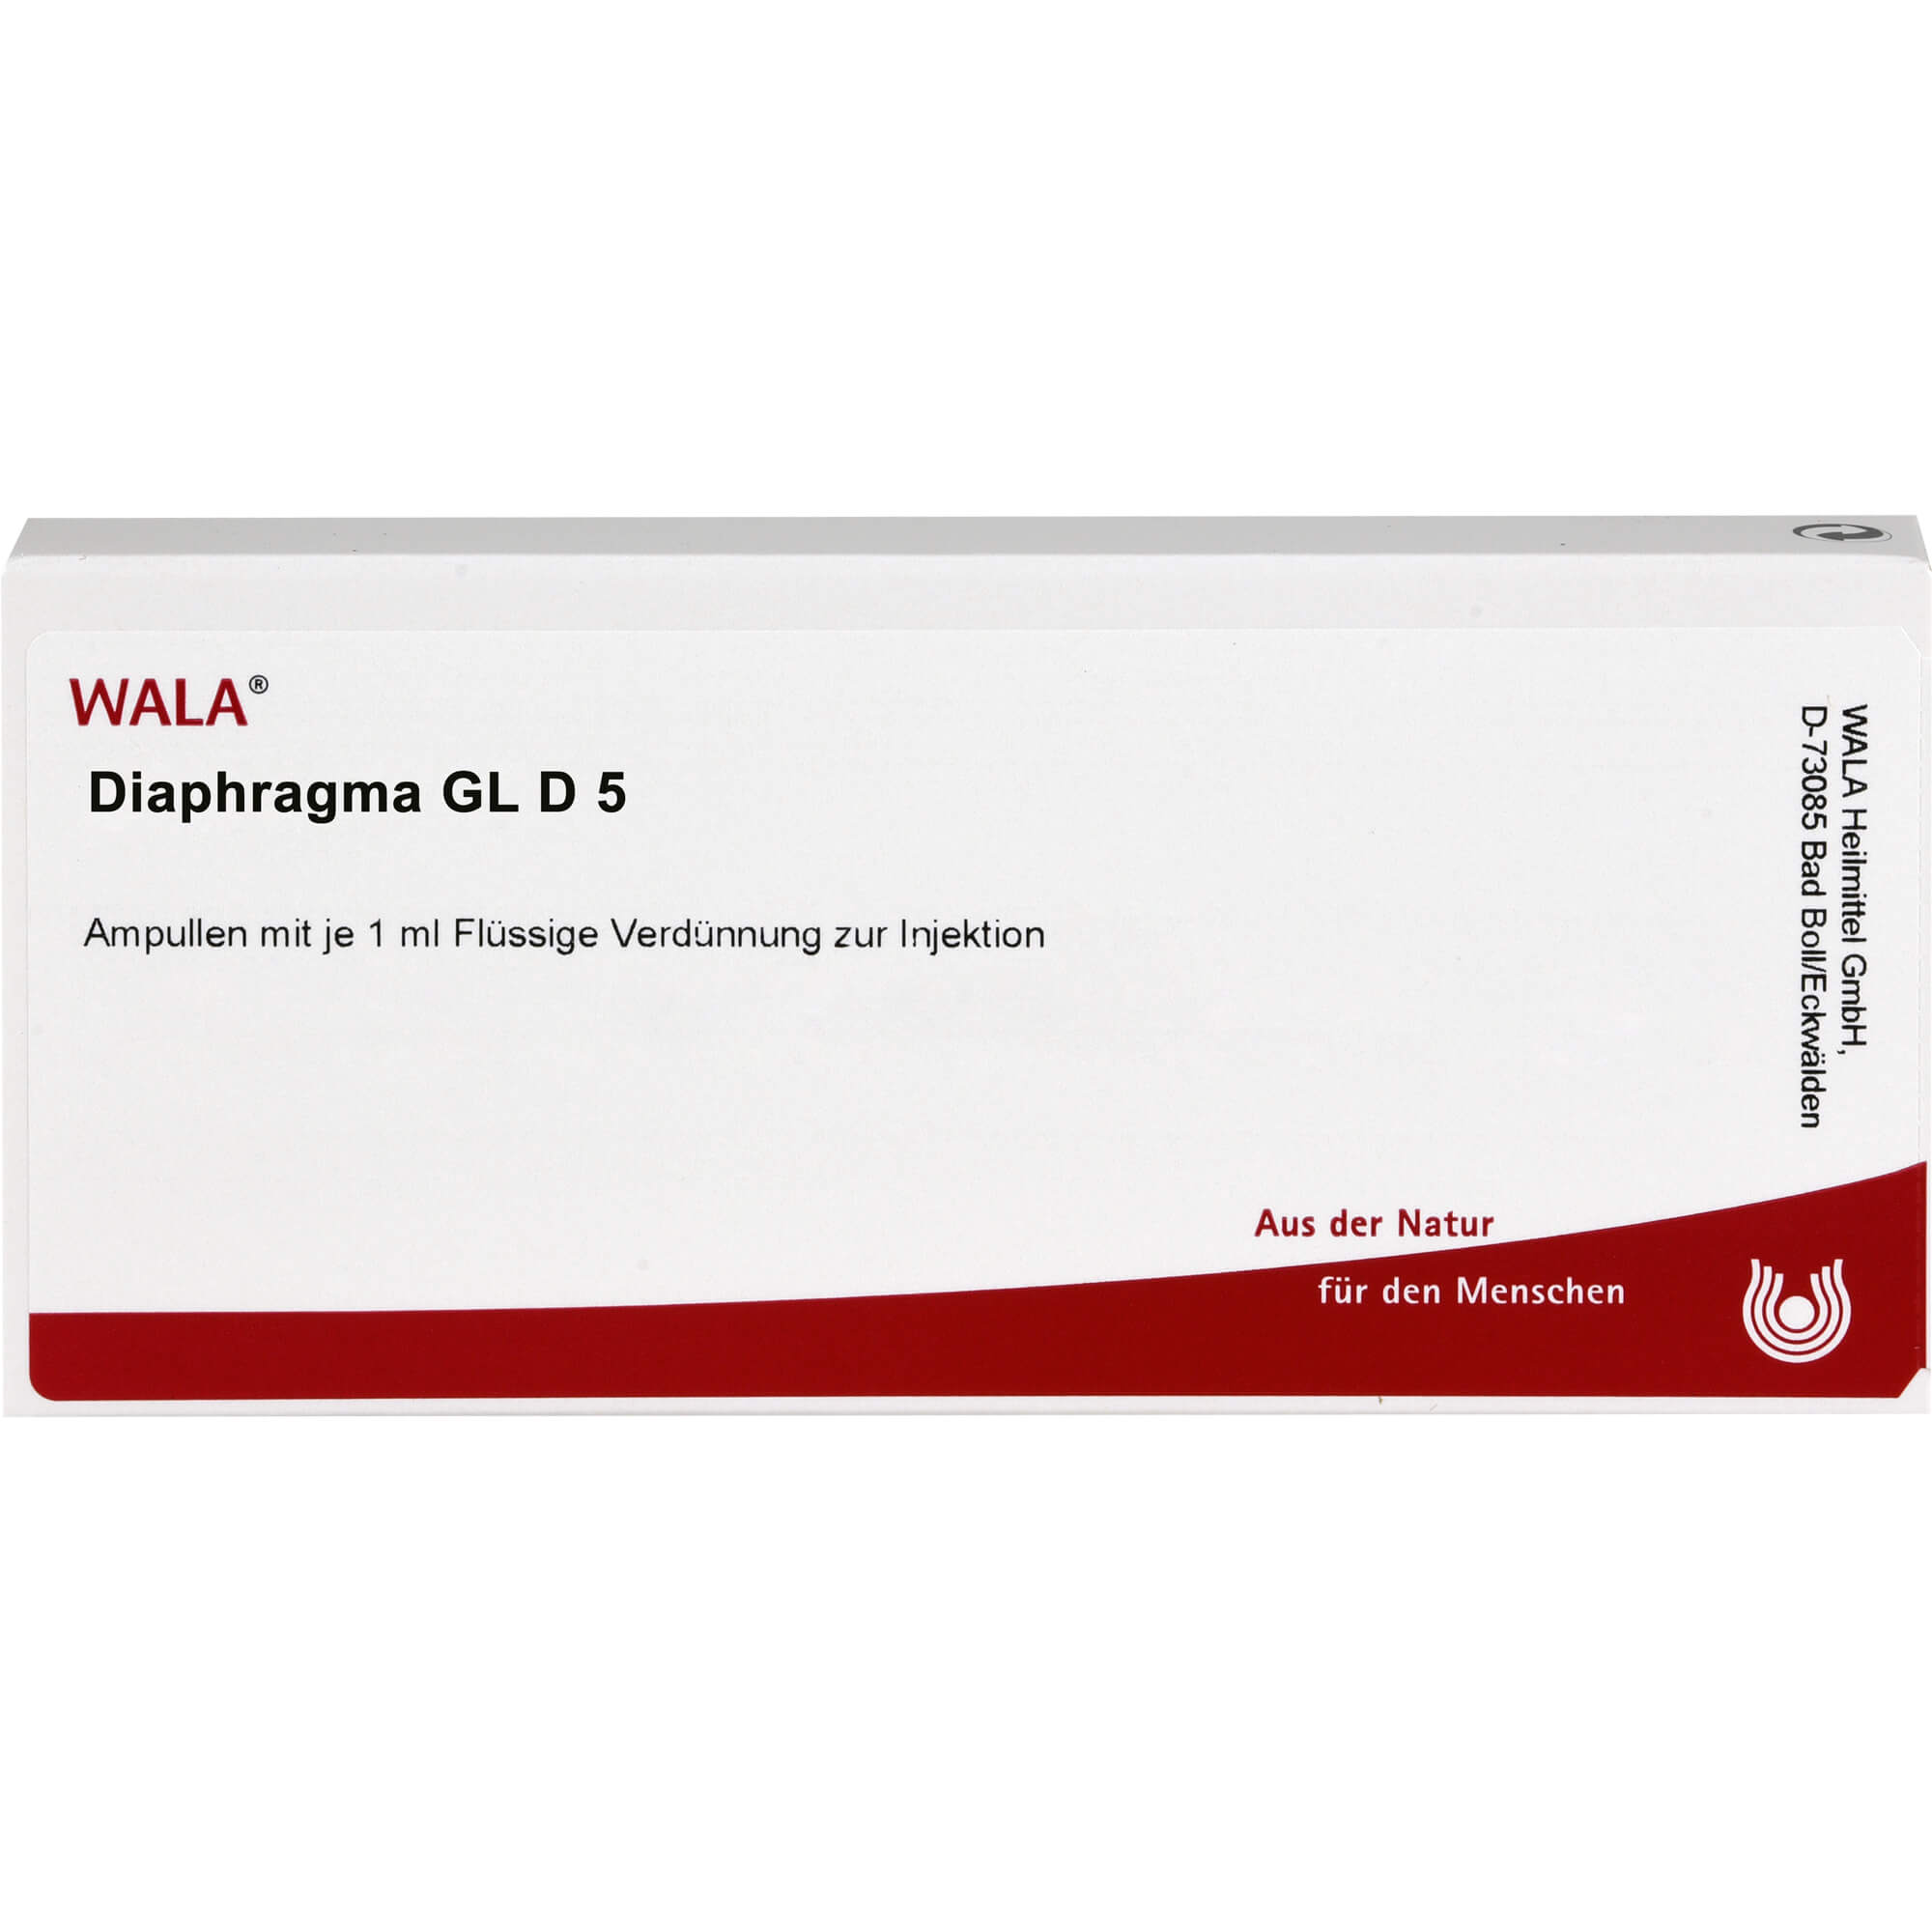 DIAPHRAGMA GL D 5 Ampullen